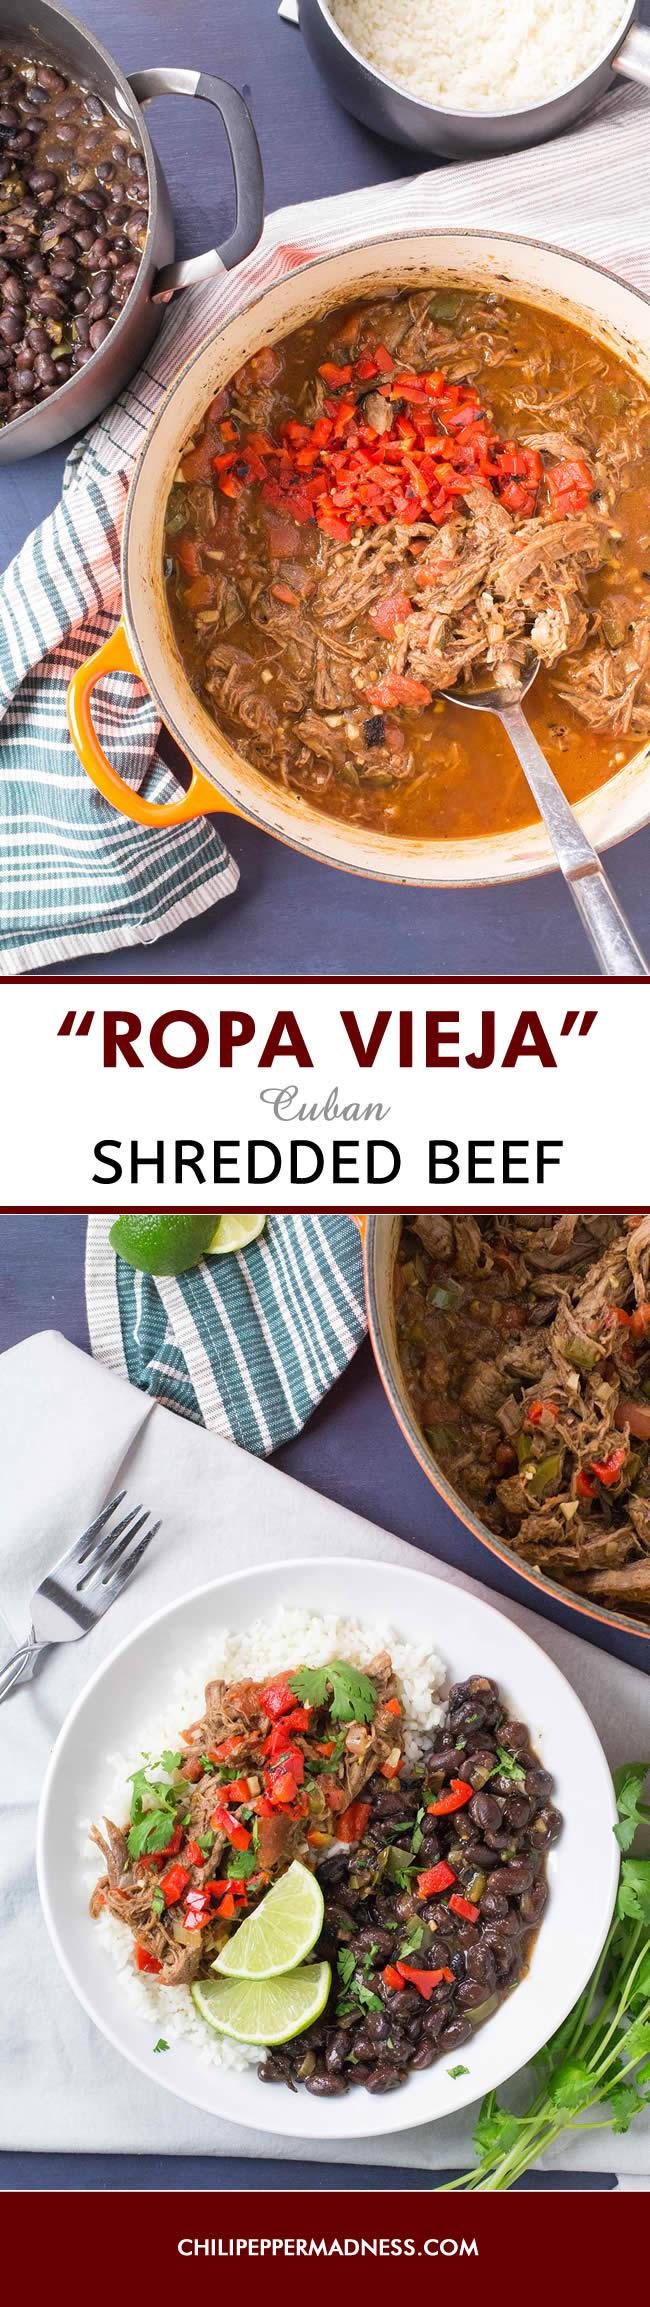 Ropa Vieja - Cuban Shredded Beef - Recipe